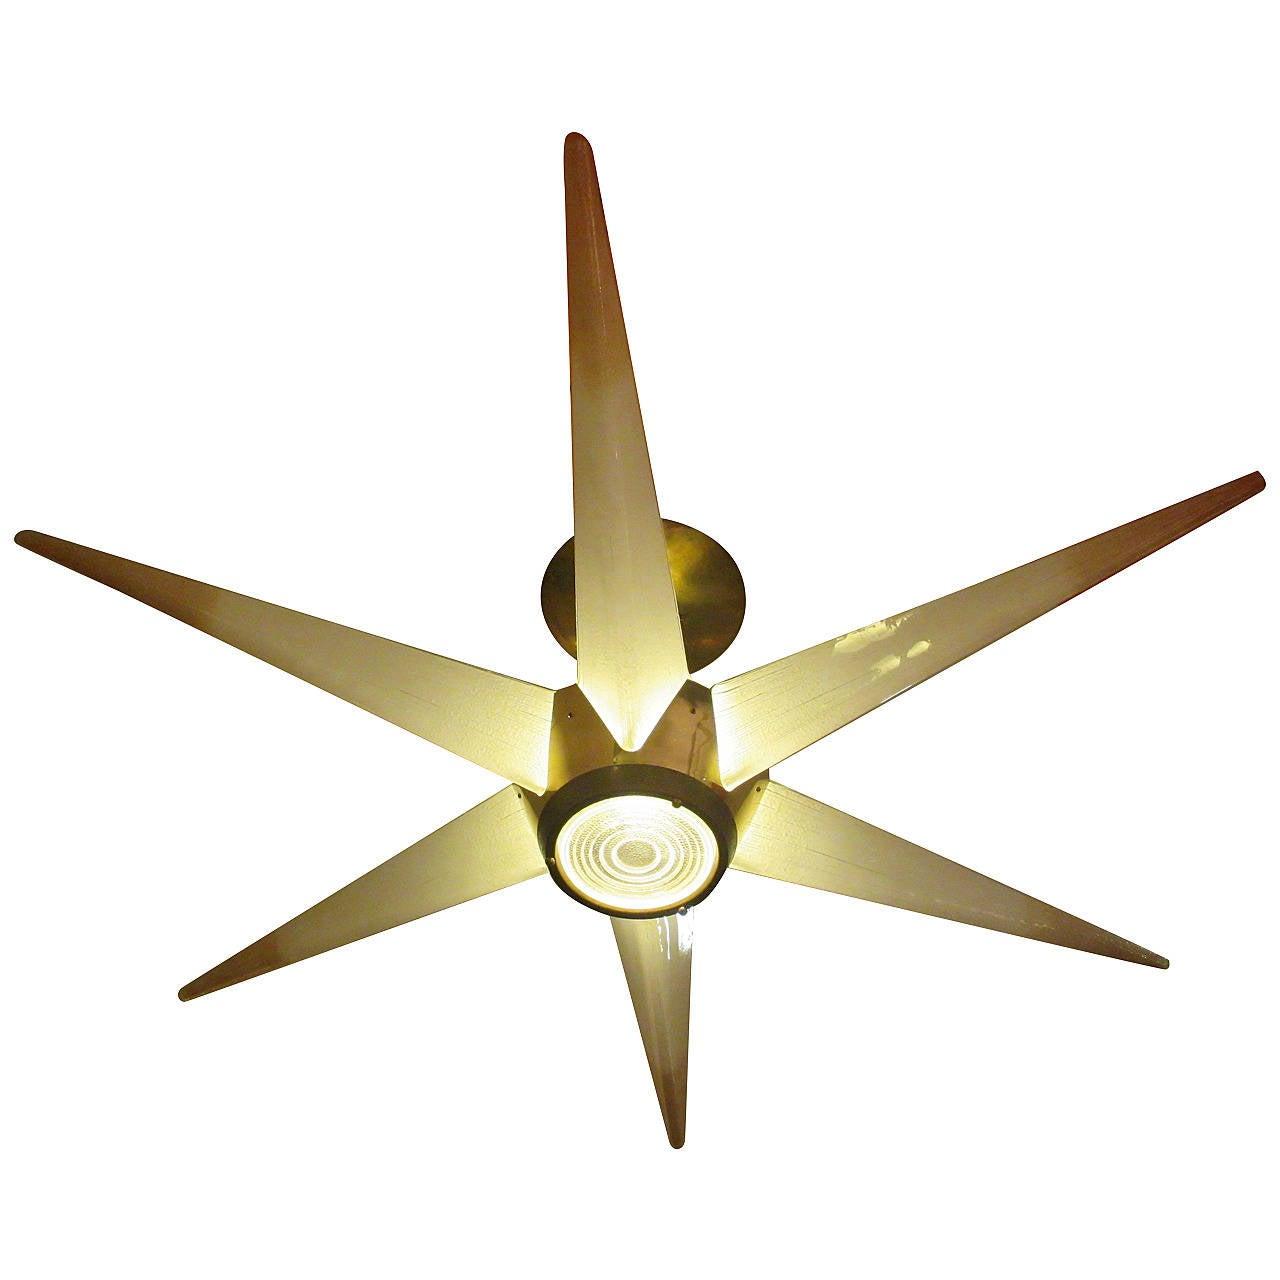 Lightolier Ring Chandelier At 1stdibs: Lightolier Star Chandelier At 1stdibs